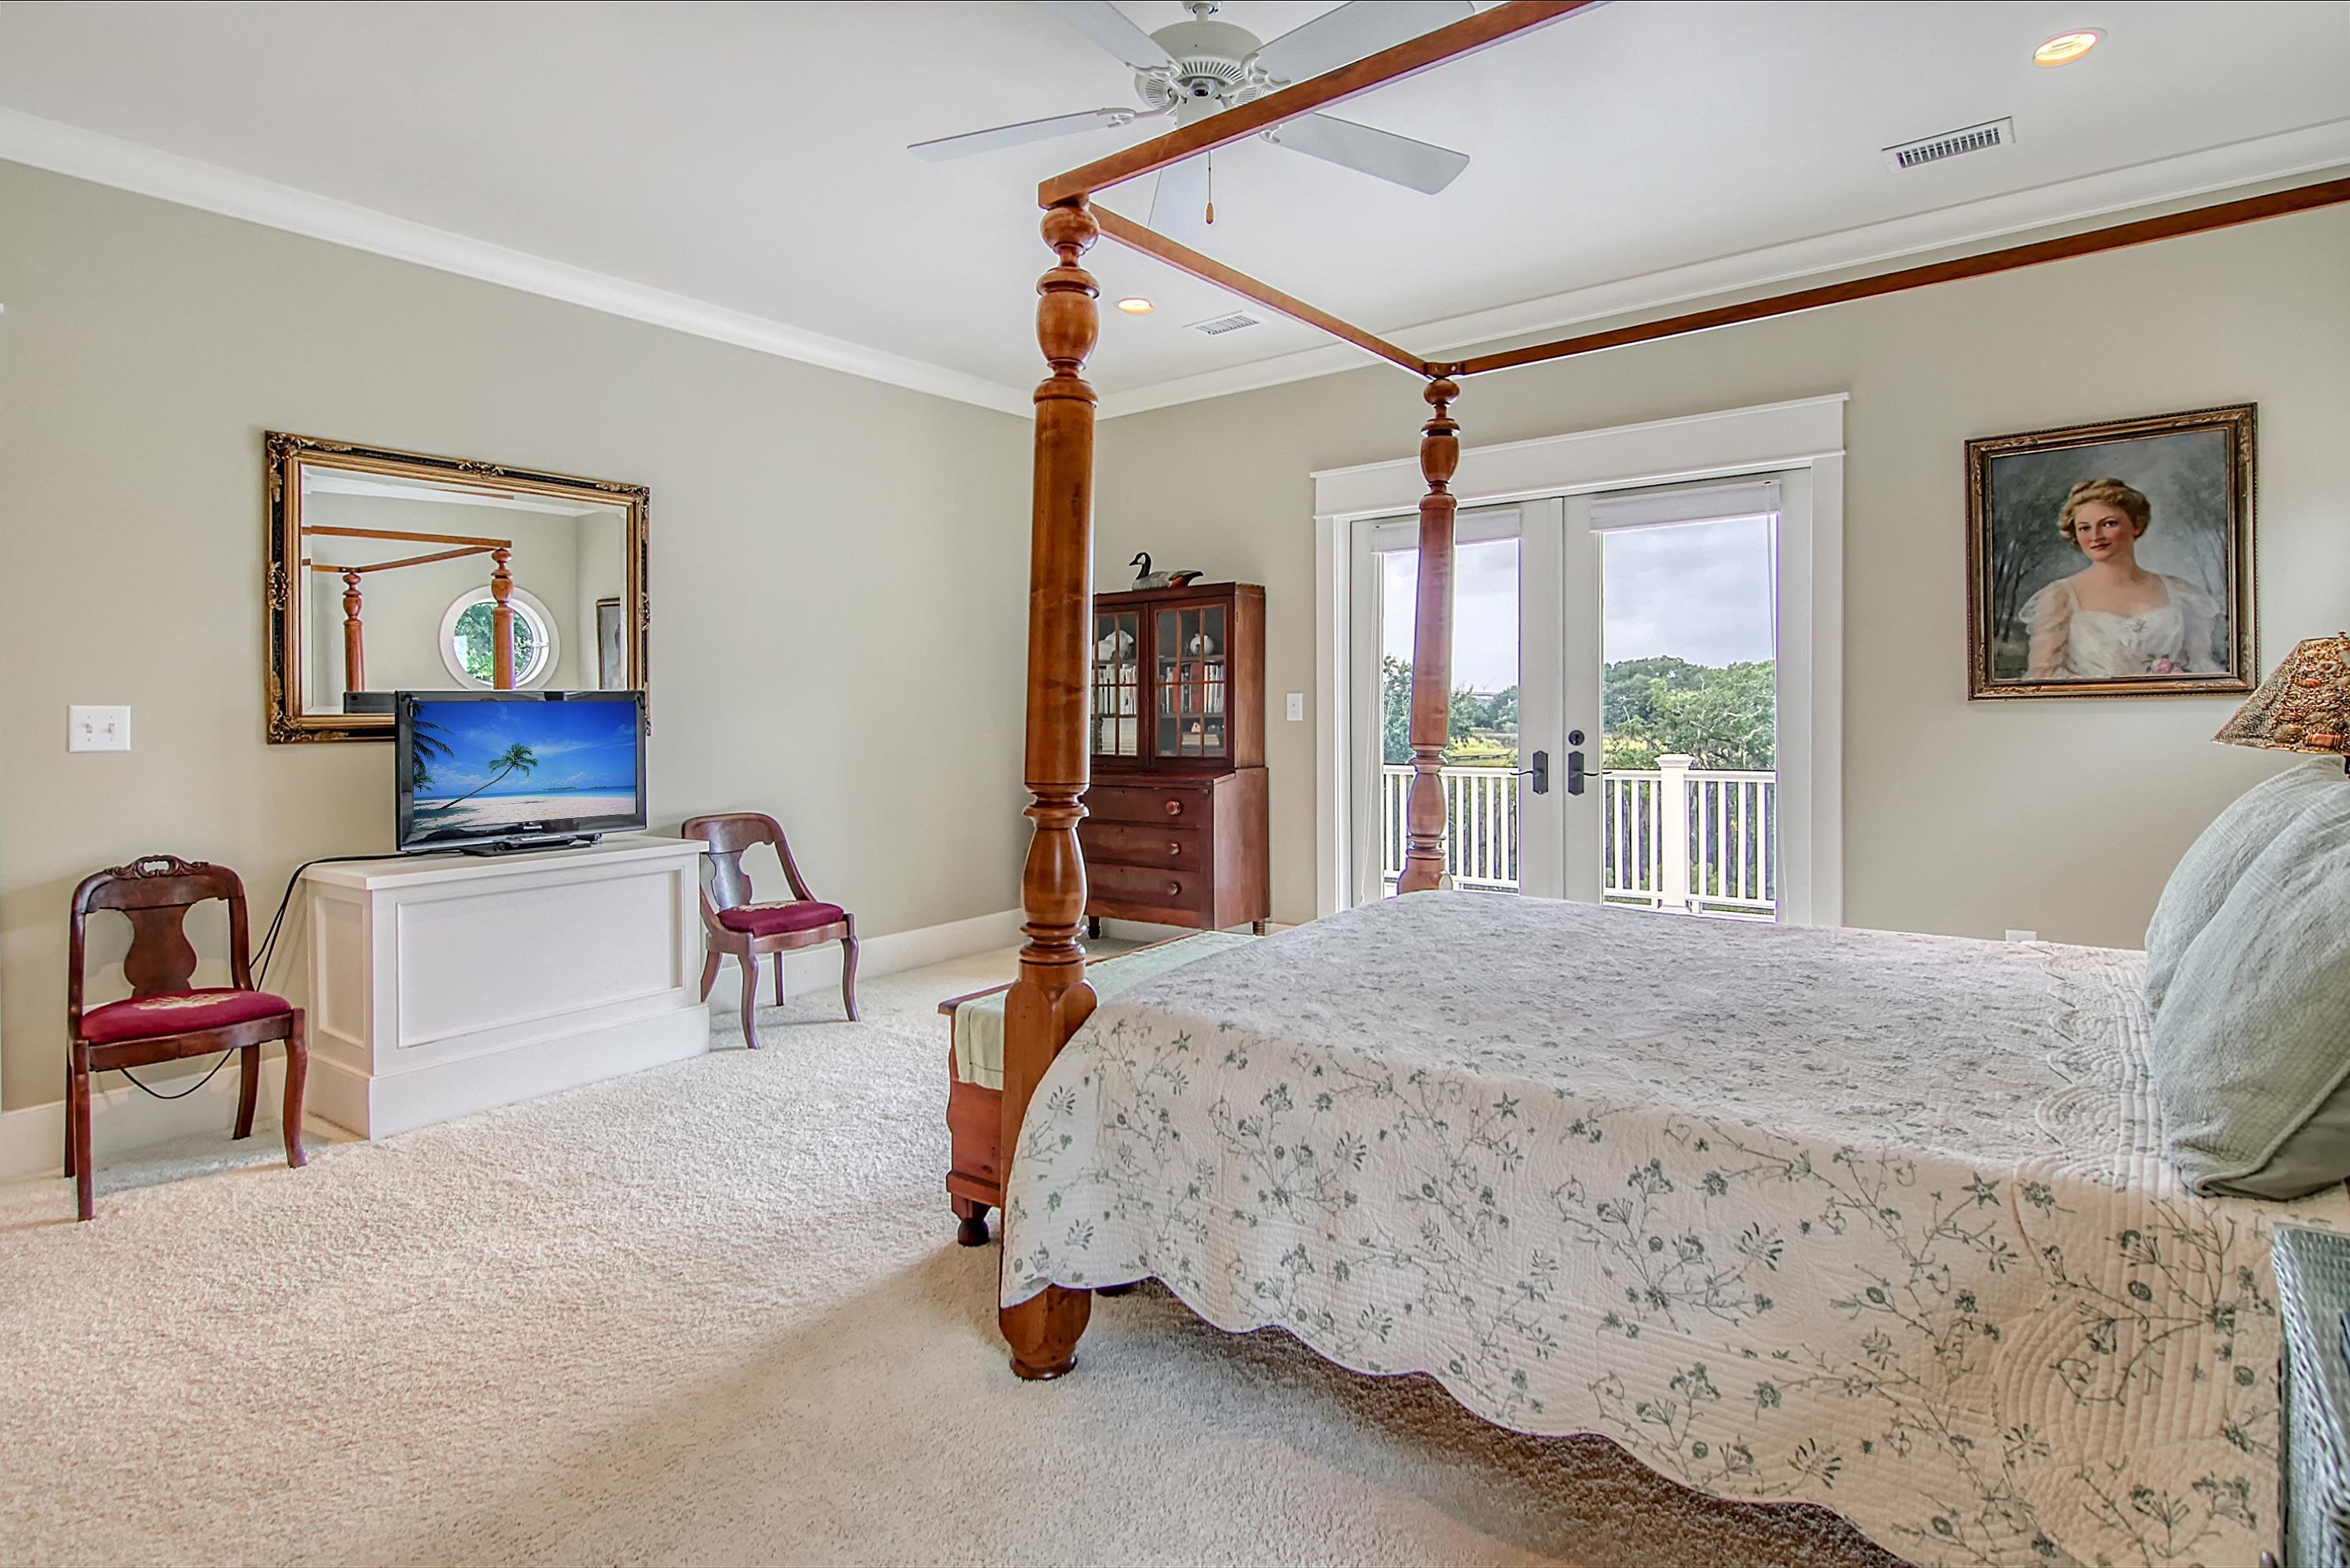 Scanlonville Homes For Sale - 152 6th, Mount Pleasant, SC - 64